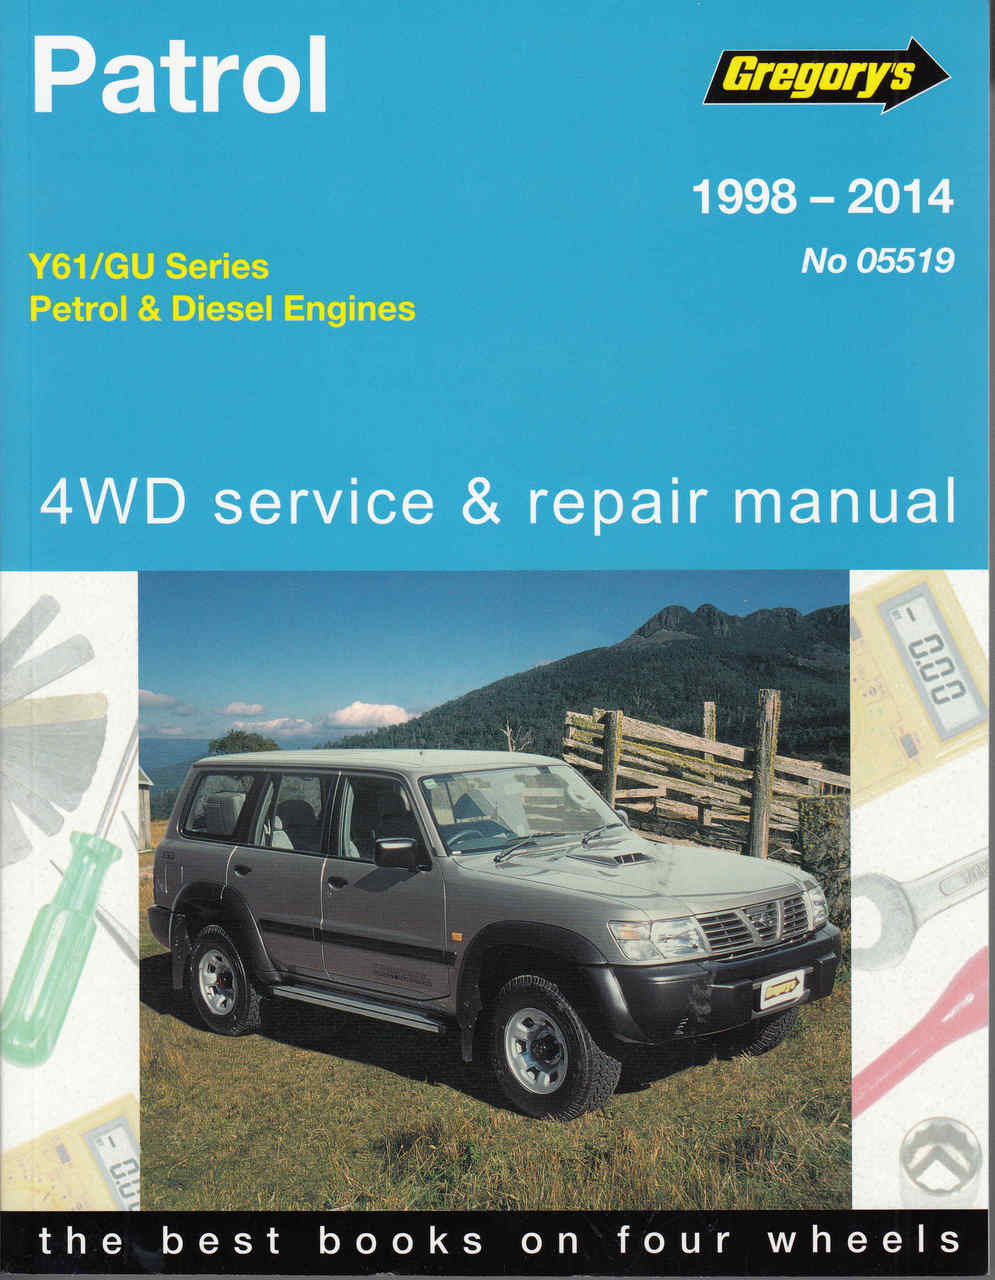 nissan patrol y61 guseries petrol diesel 1998 2014 workshop manua rh automotobookshop com au nissan patrol service manual gq patrol service manual - y60